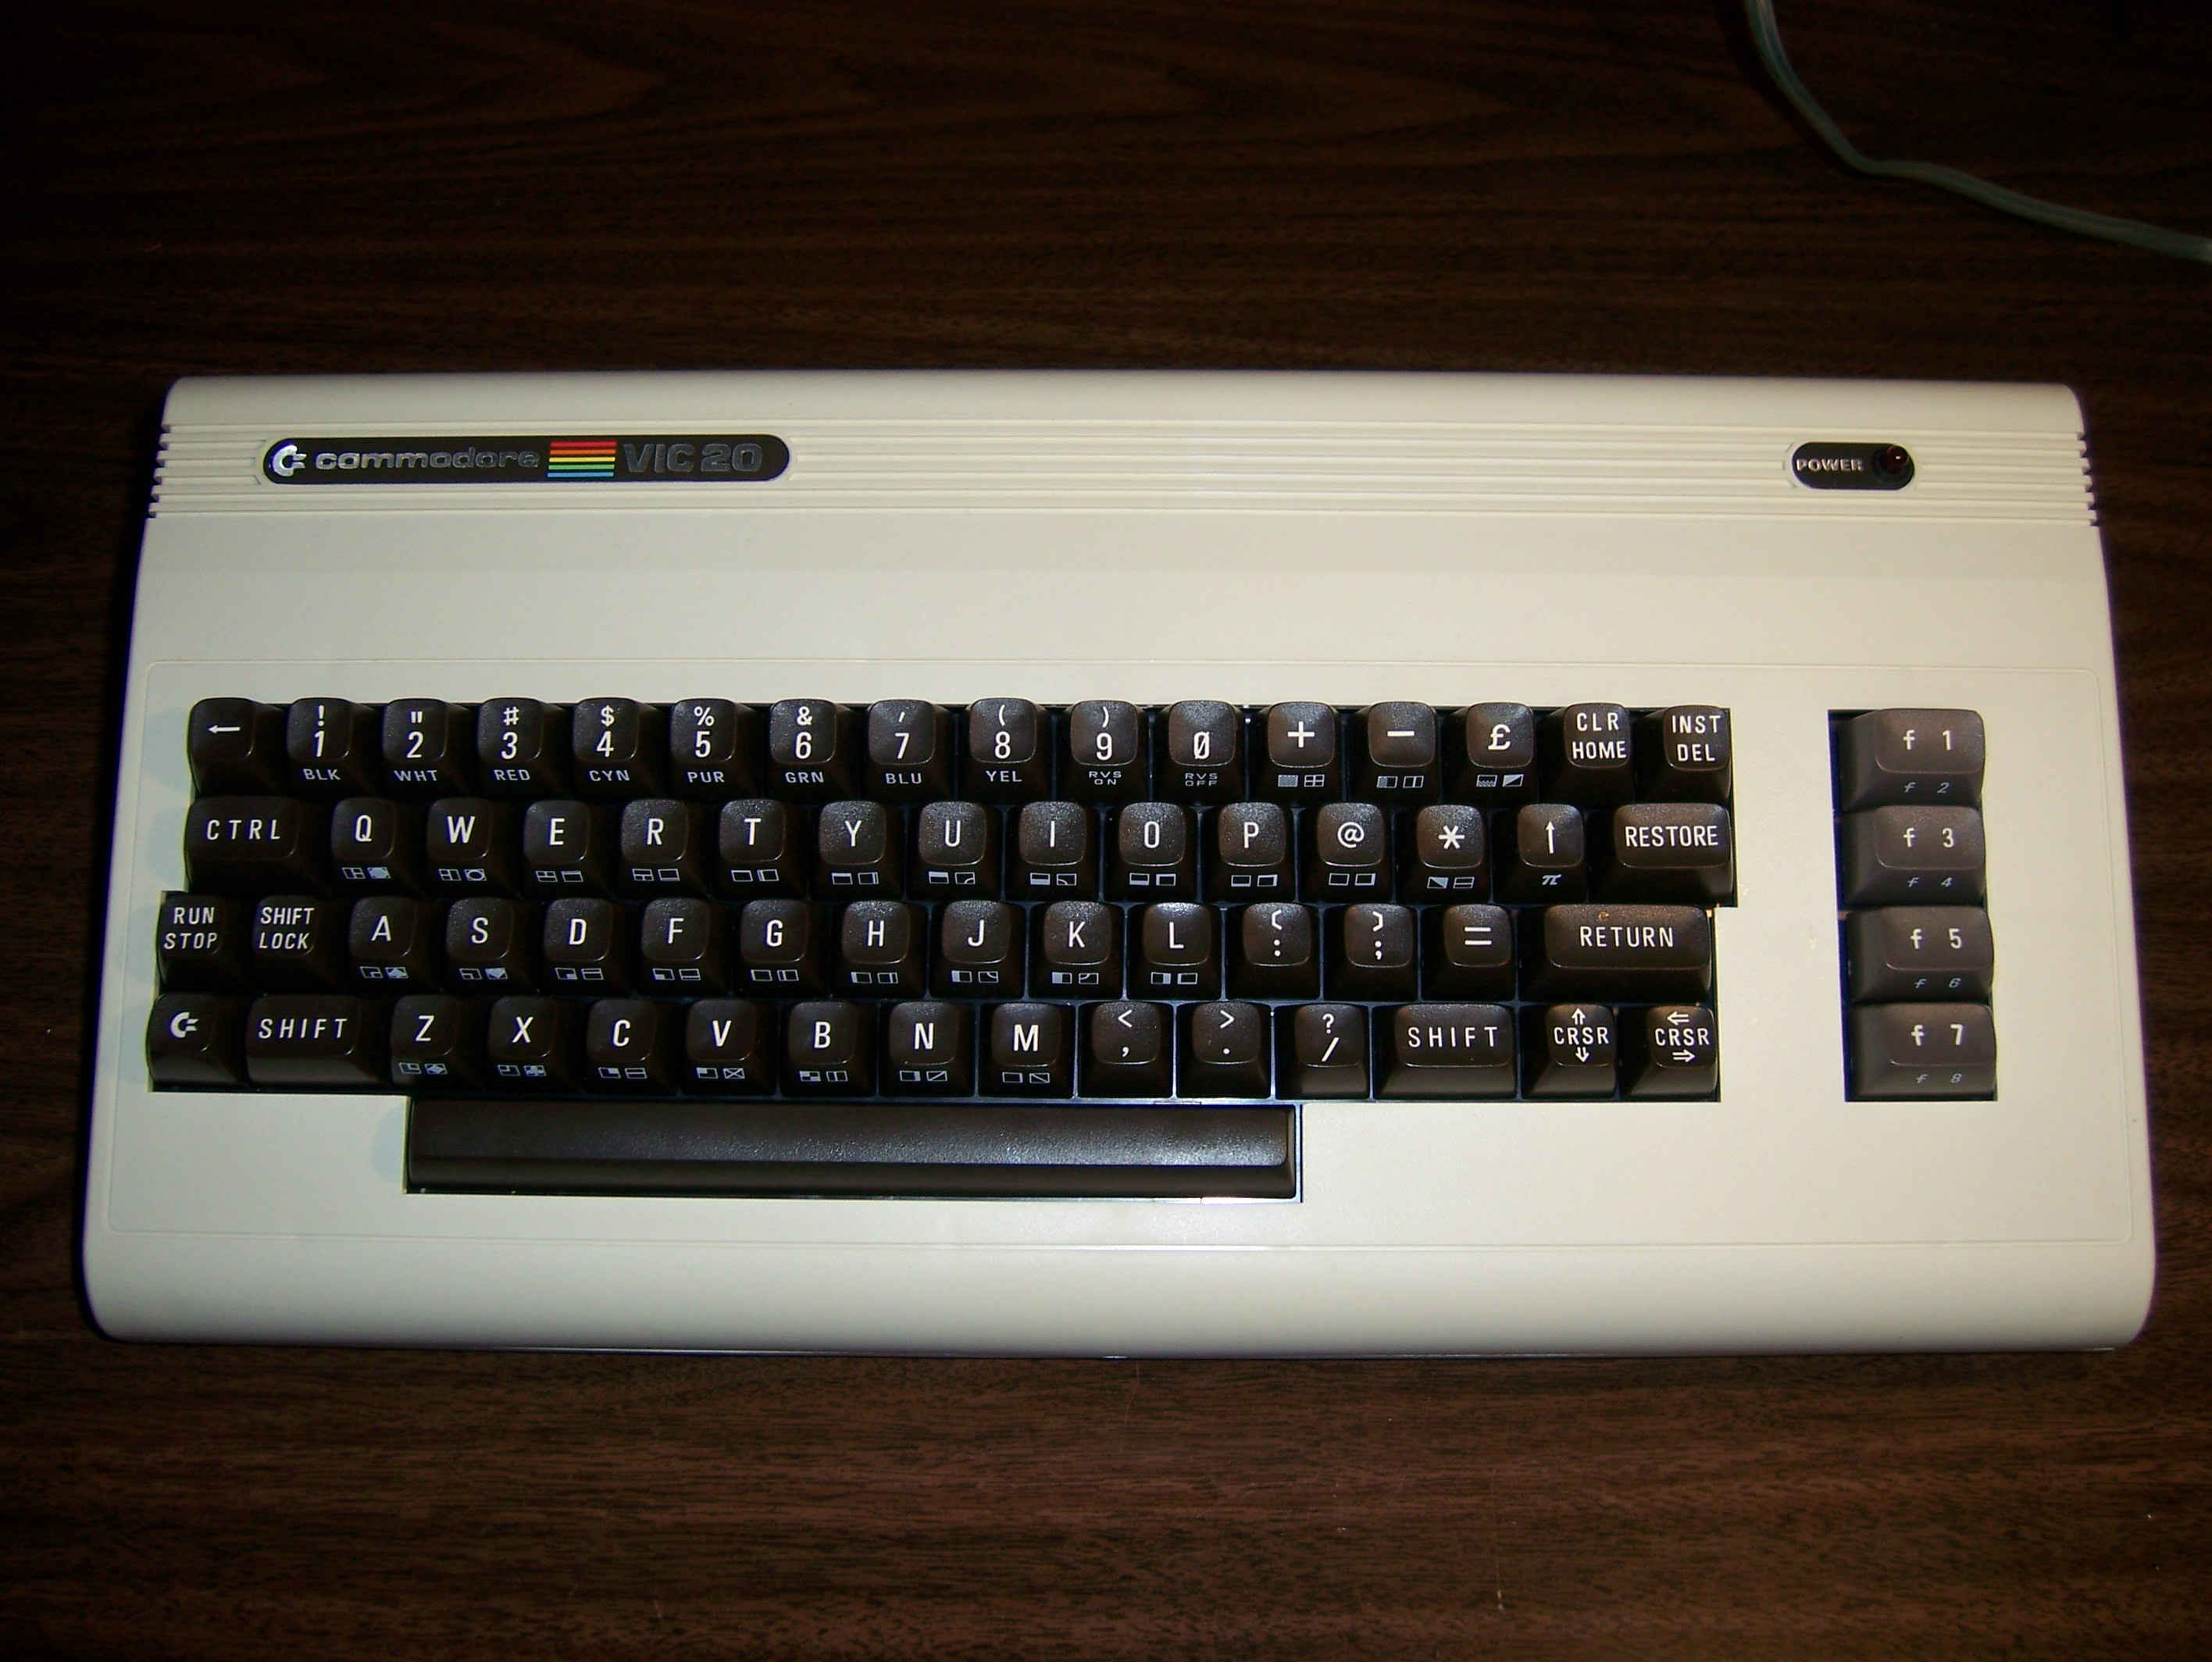 File:Commodore VIC 20 computer2.jpg - Wikimedia Commons